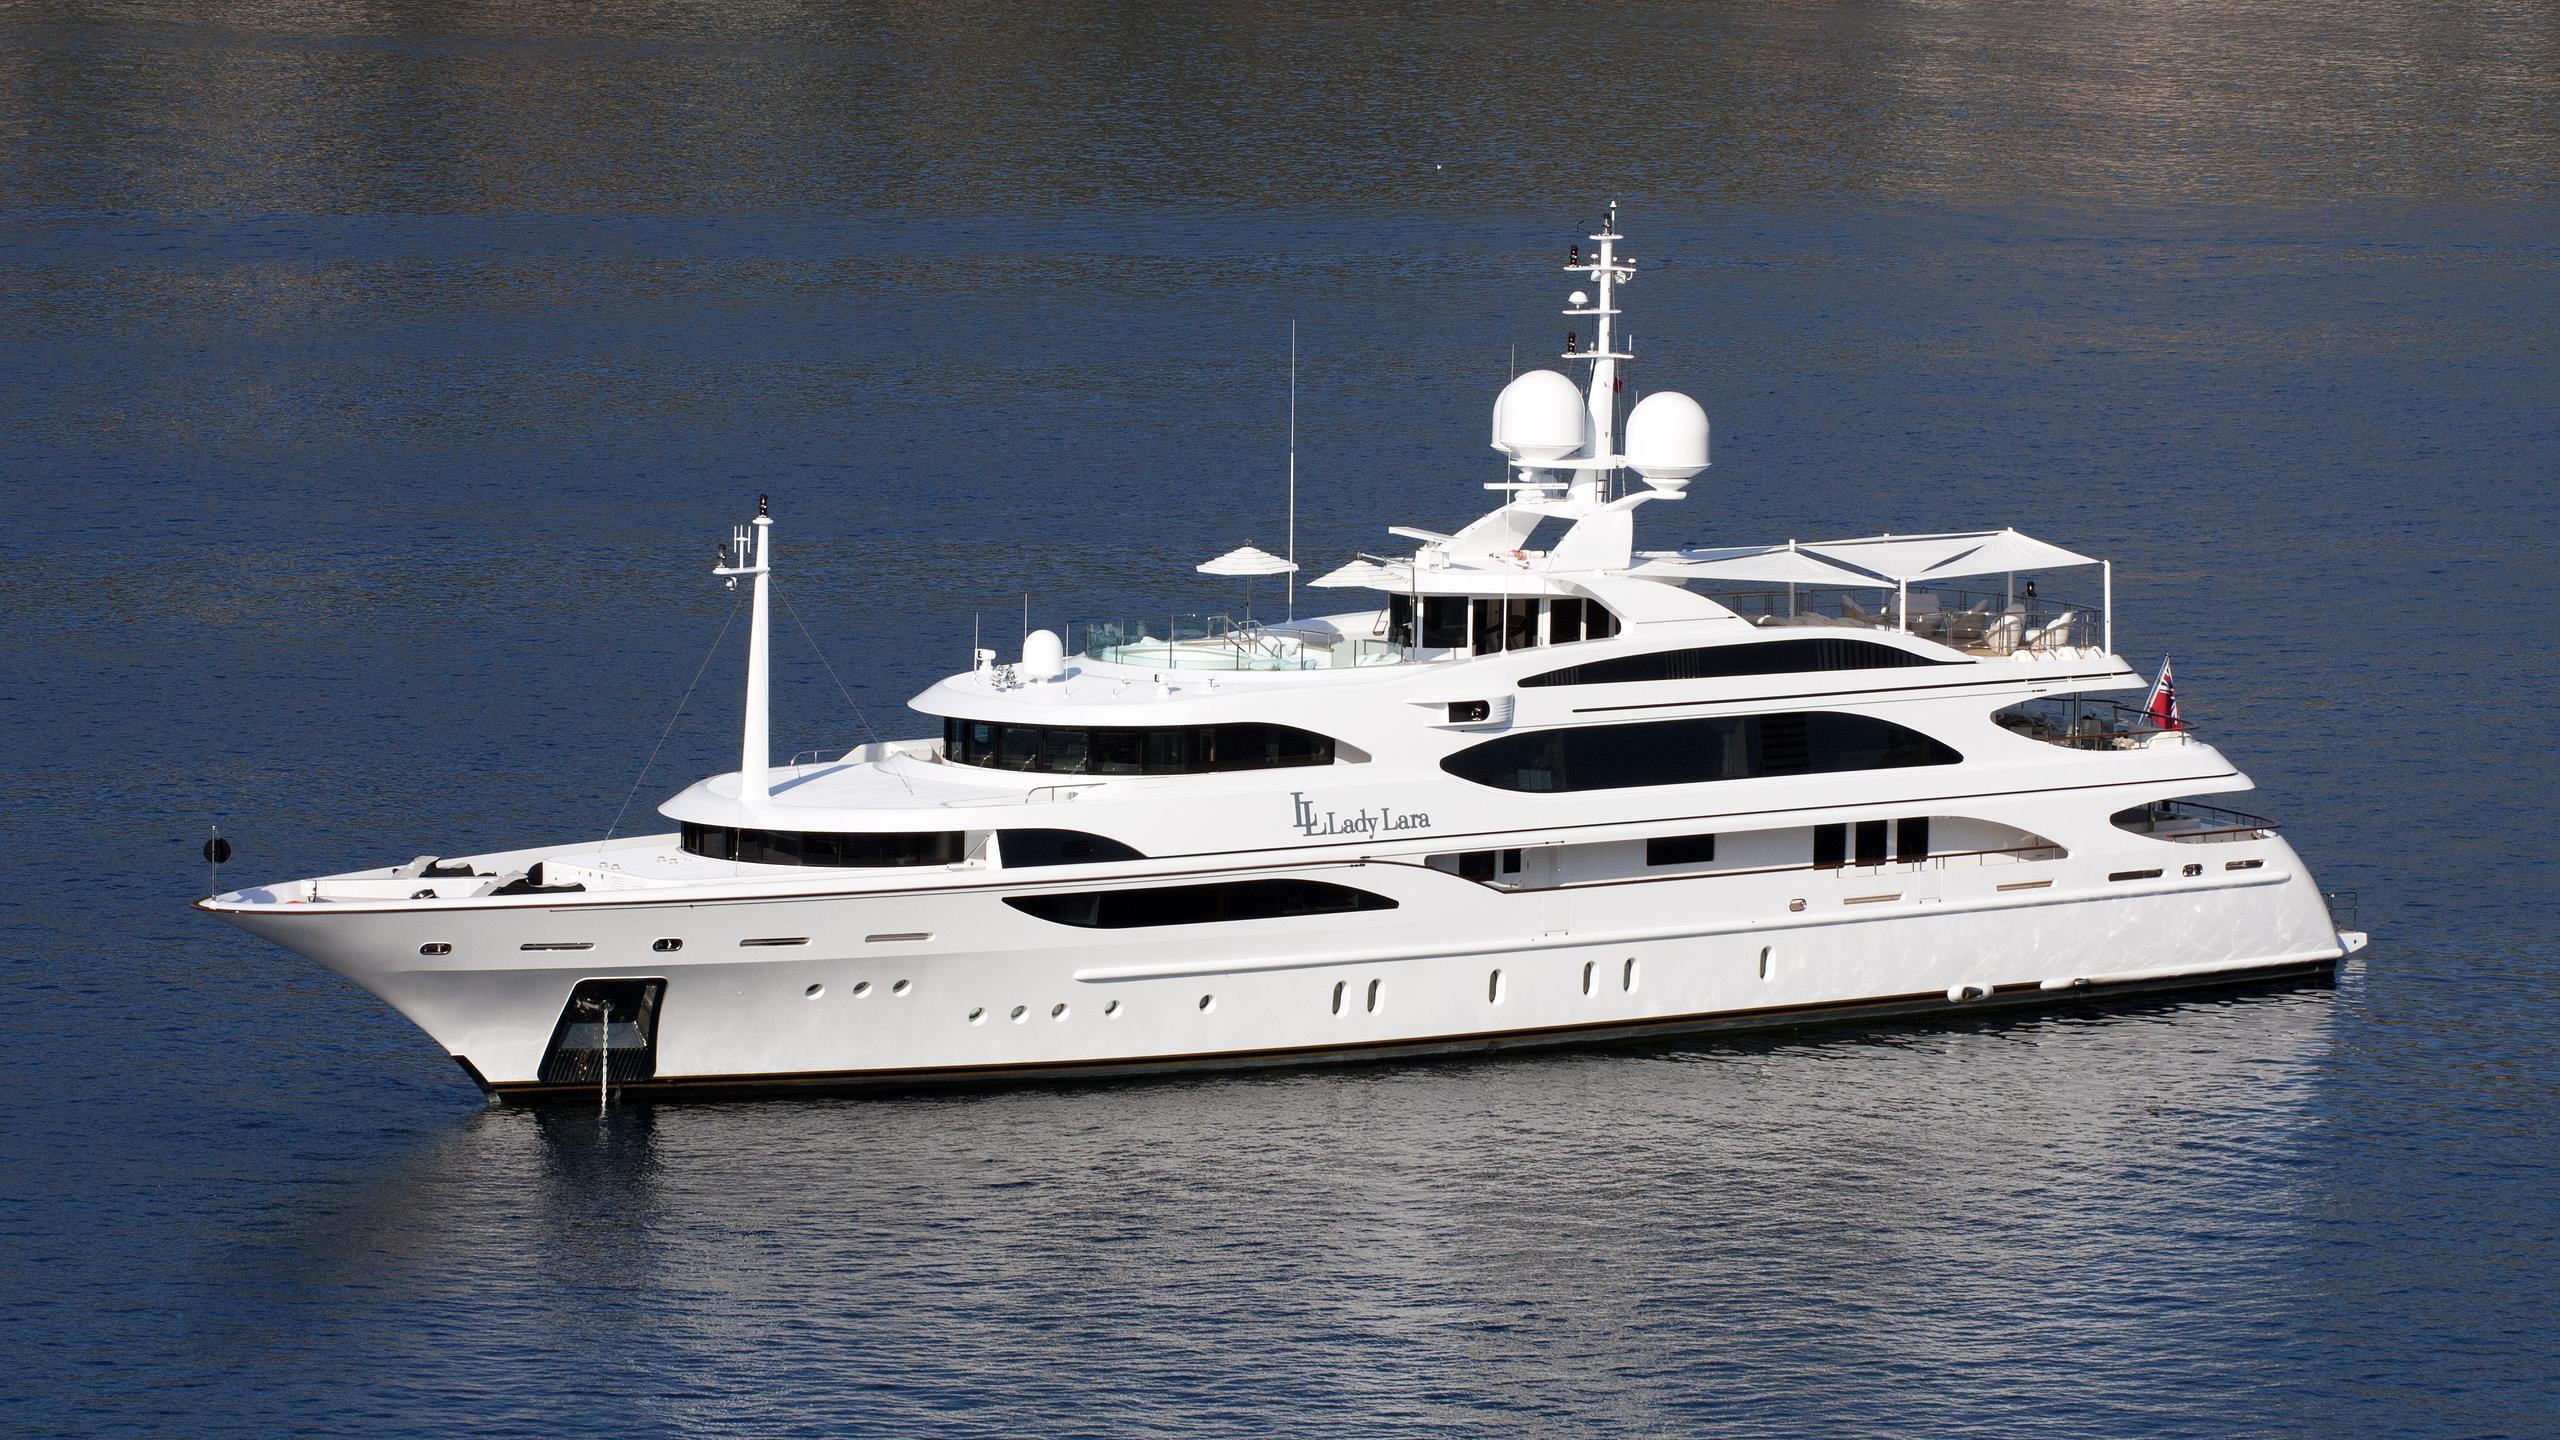 andiamo-lady-luck-motor-yacht-benetti-2009-59m-profile